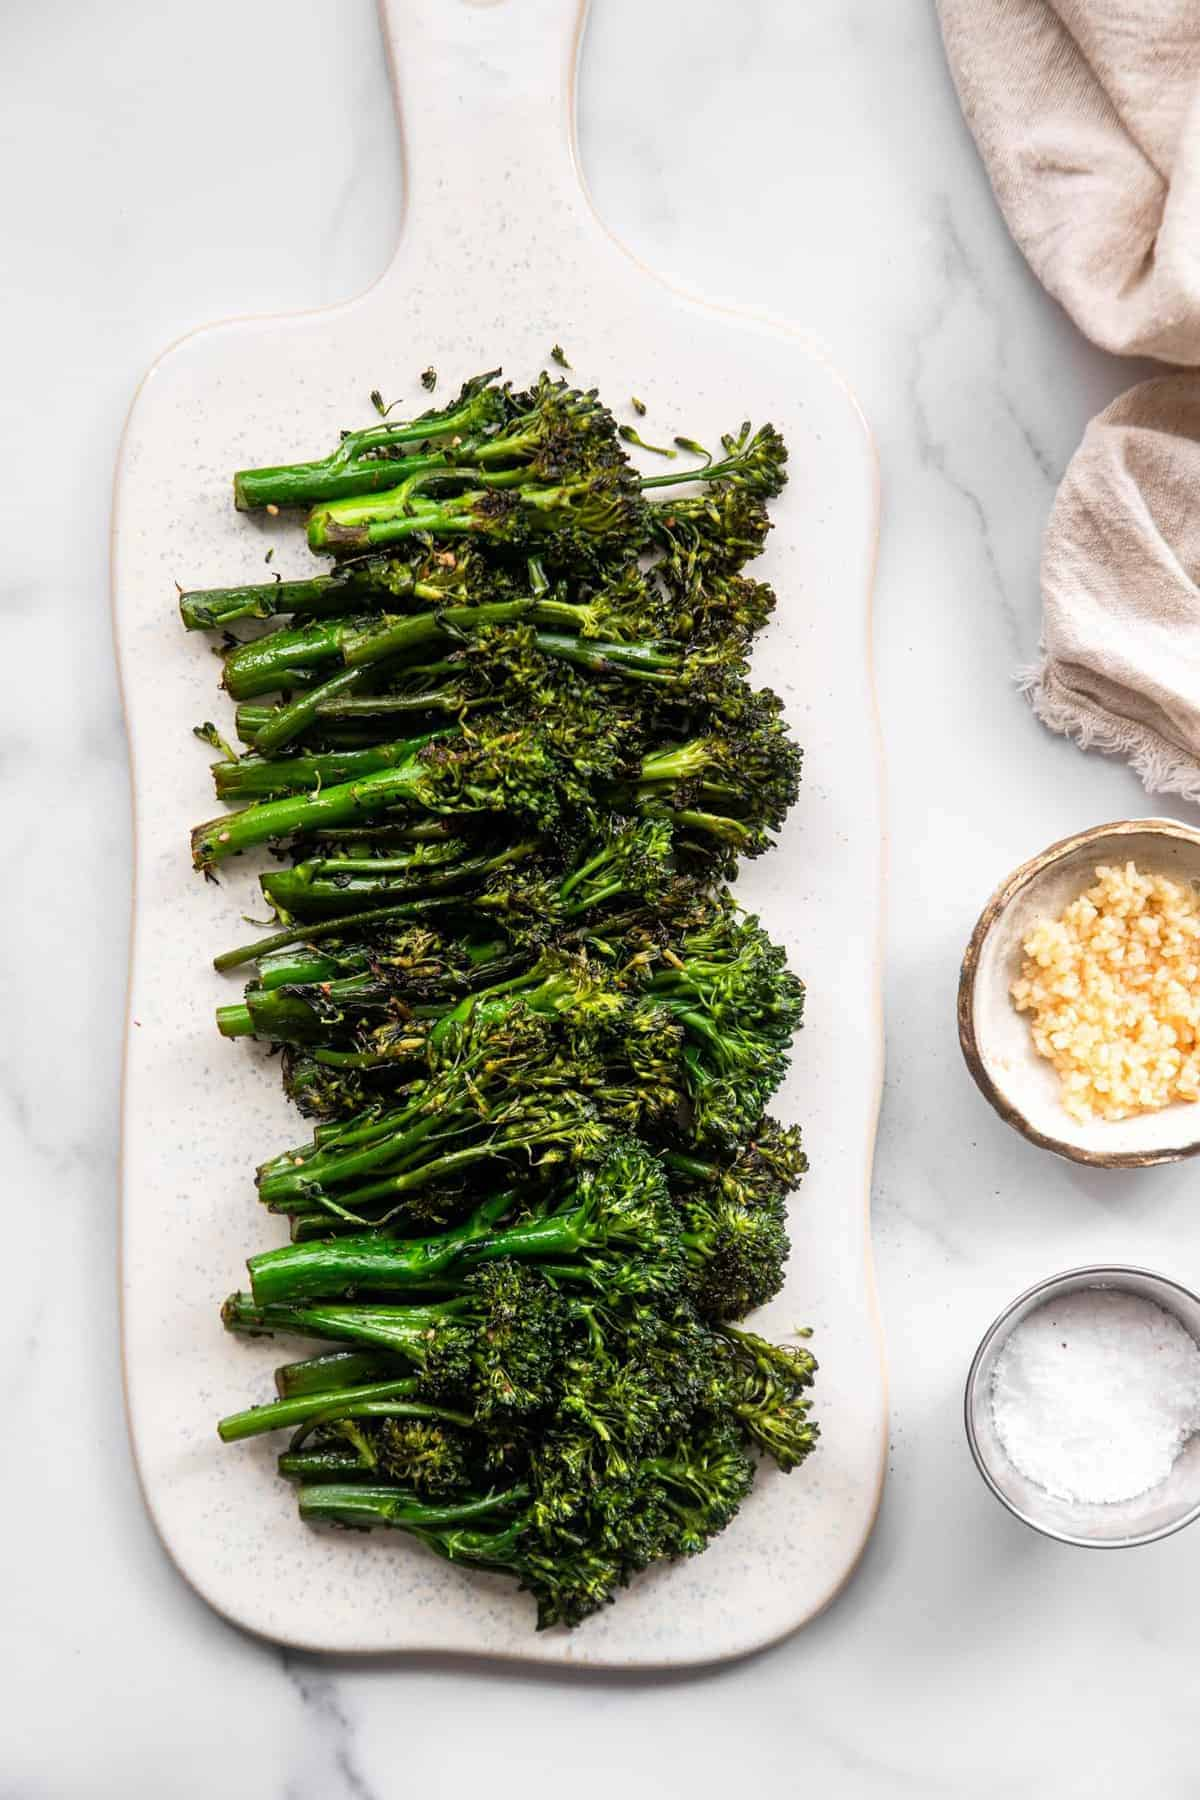 Sautéed broccolini on a plate with seasonings on the side